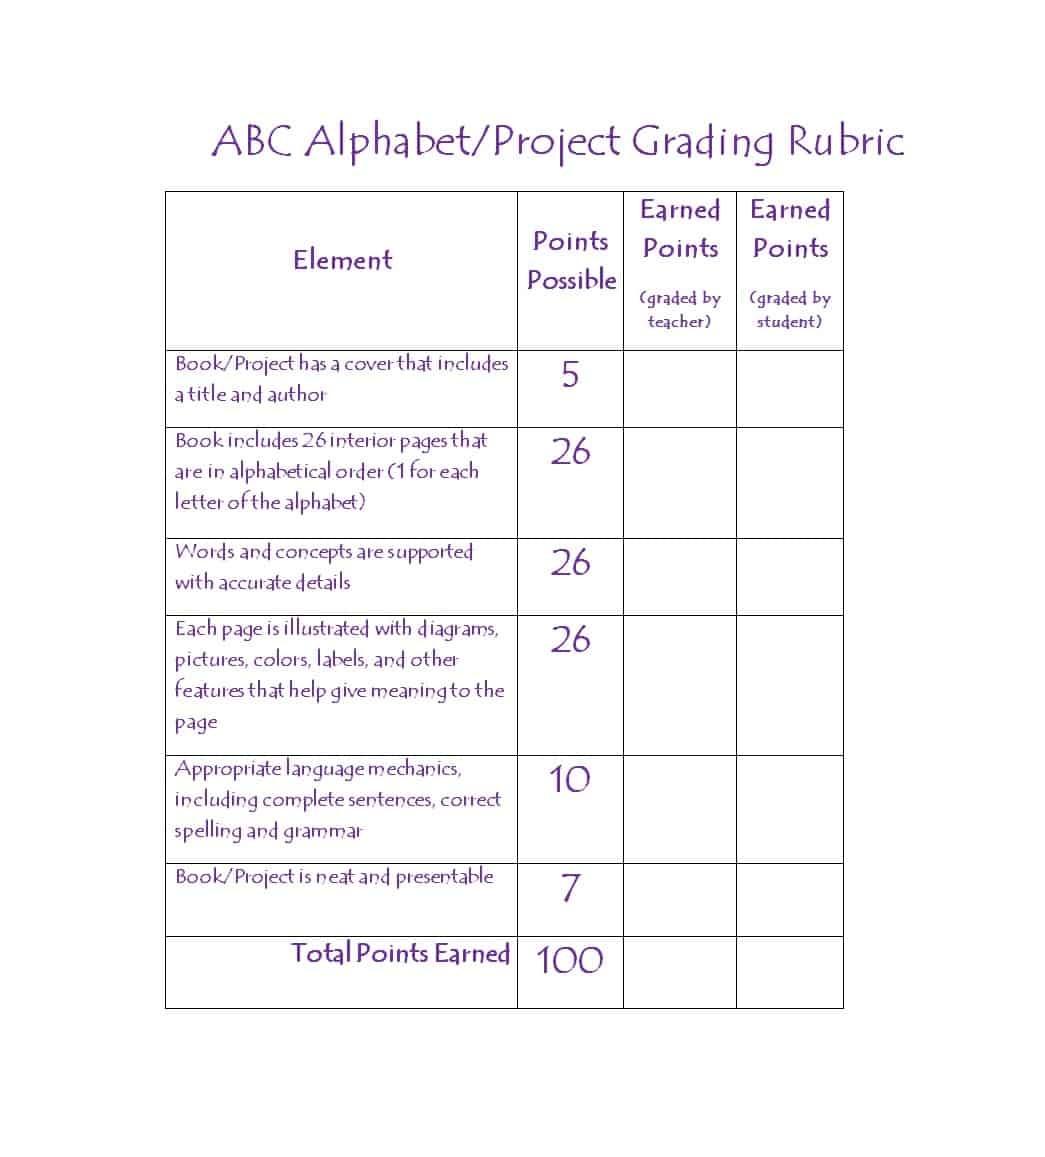 46 Editable Rubric Templates (Word Format) ᐅ Template Lab - Free Printable Rubrics For Teachers